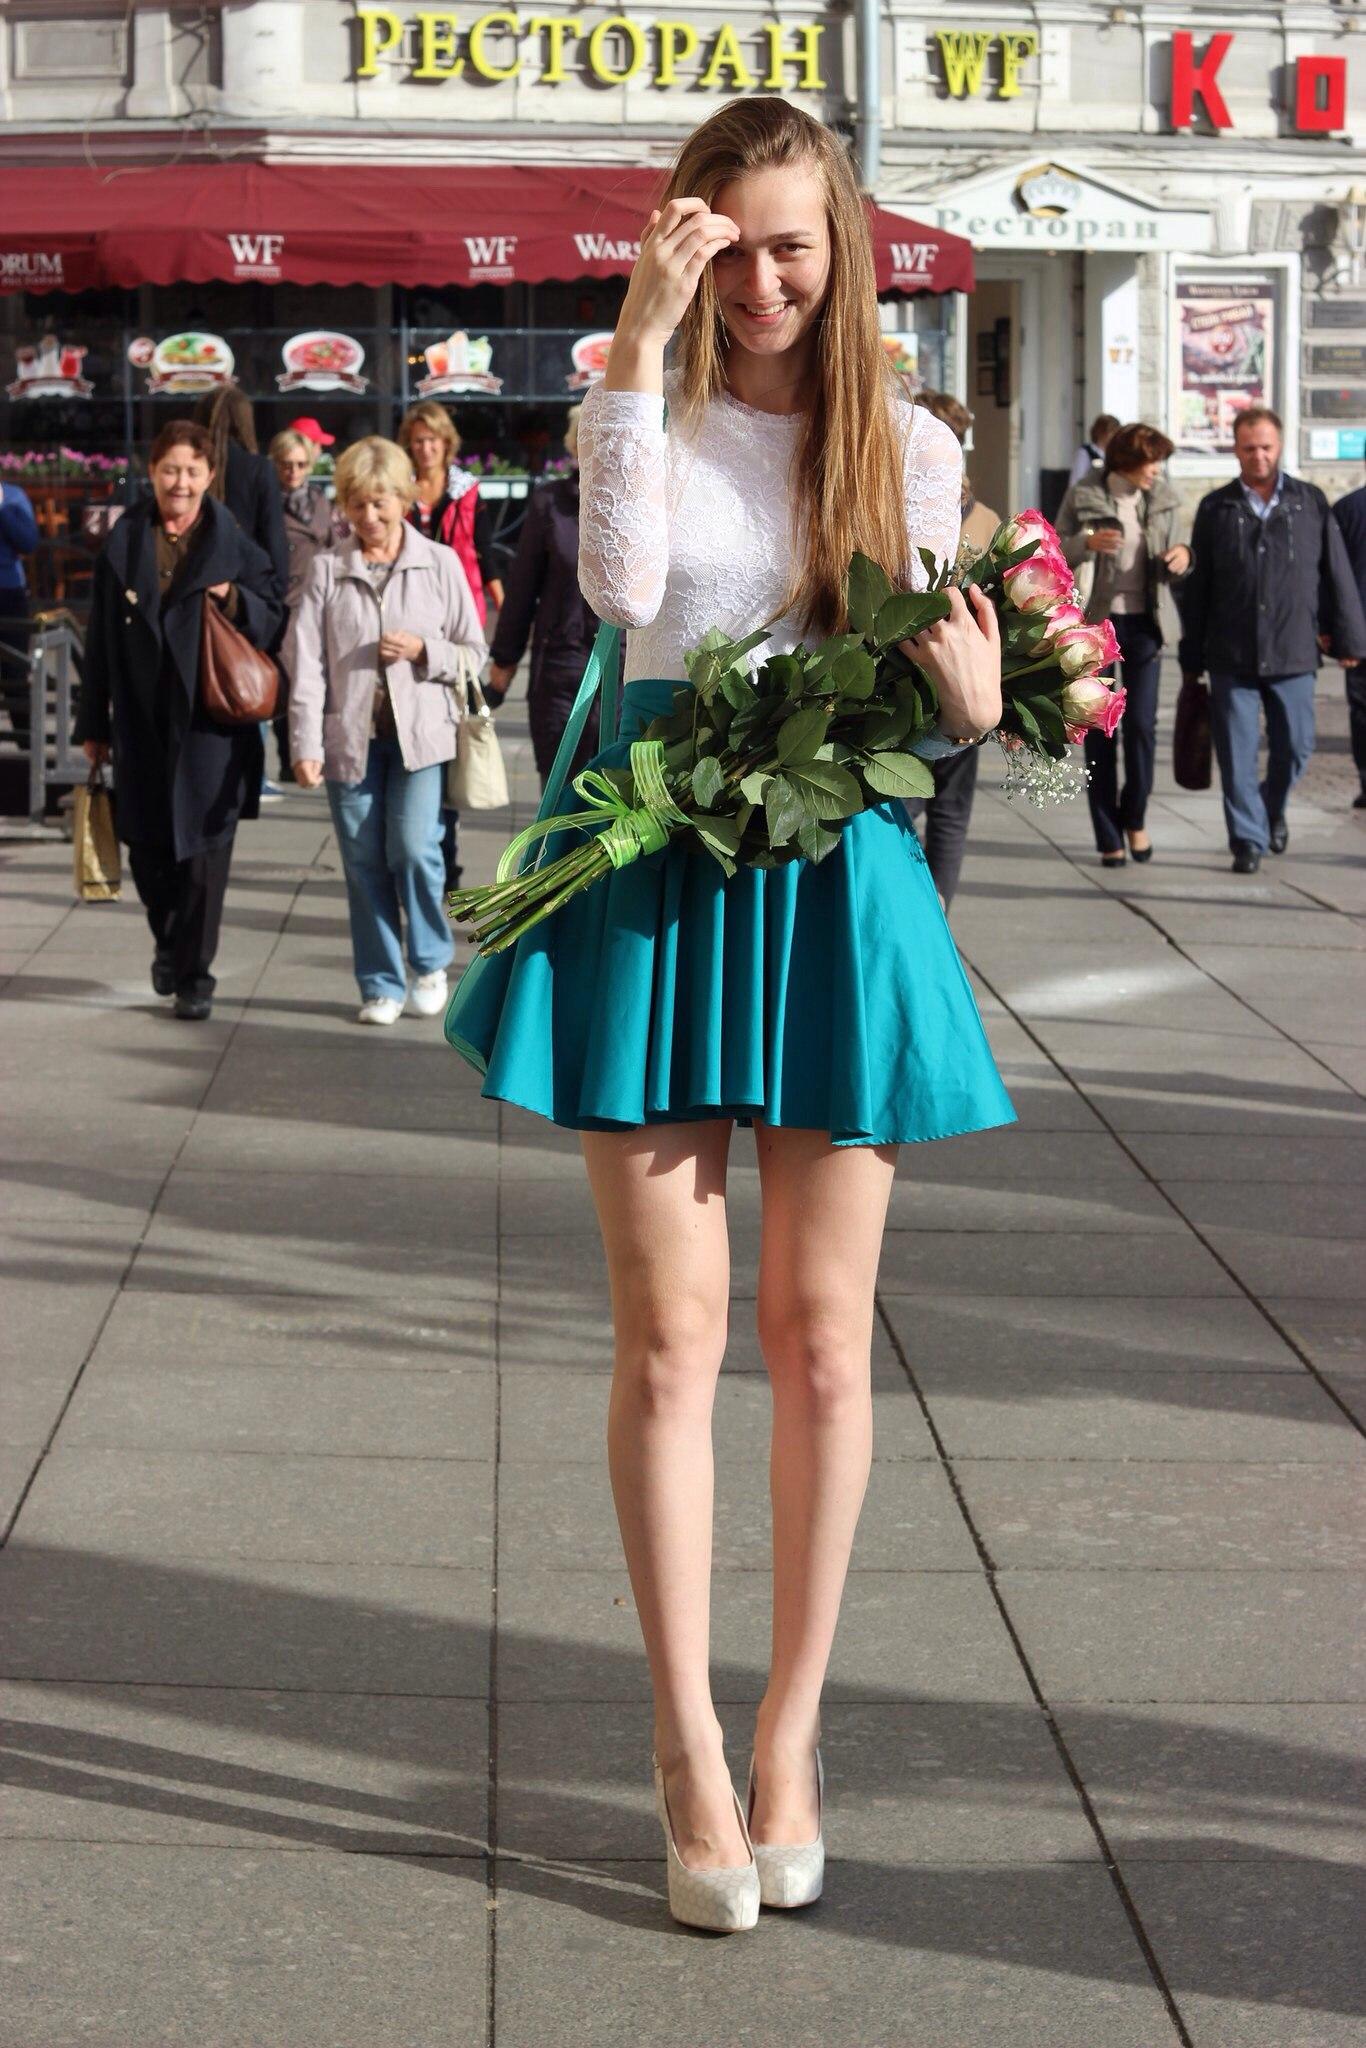 tall russian girls vi  she is 188 cm by zaratustraelsabio on